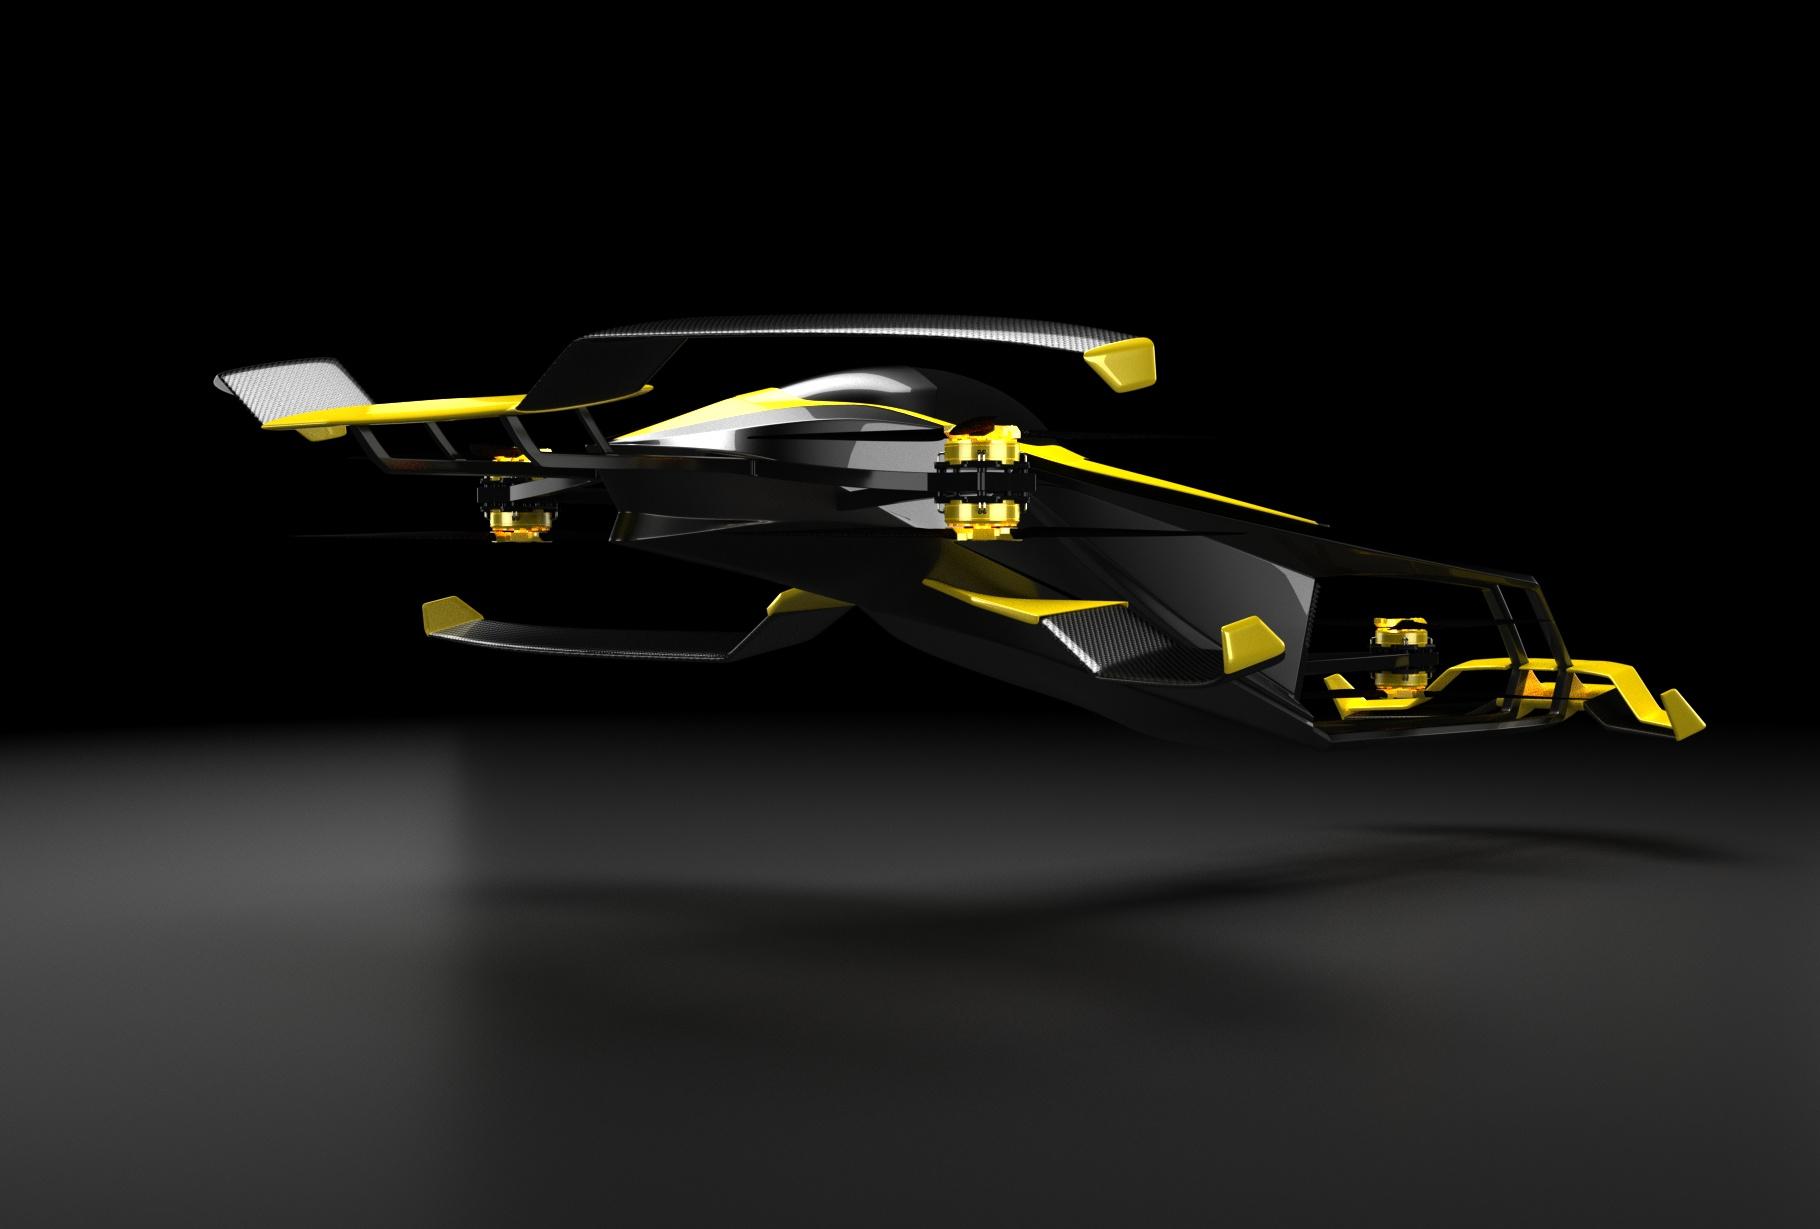 MACA hopes to develop a semi-autonomous, human-piloted H2 racing copter